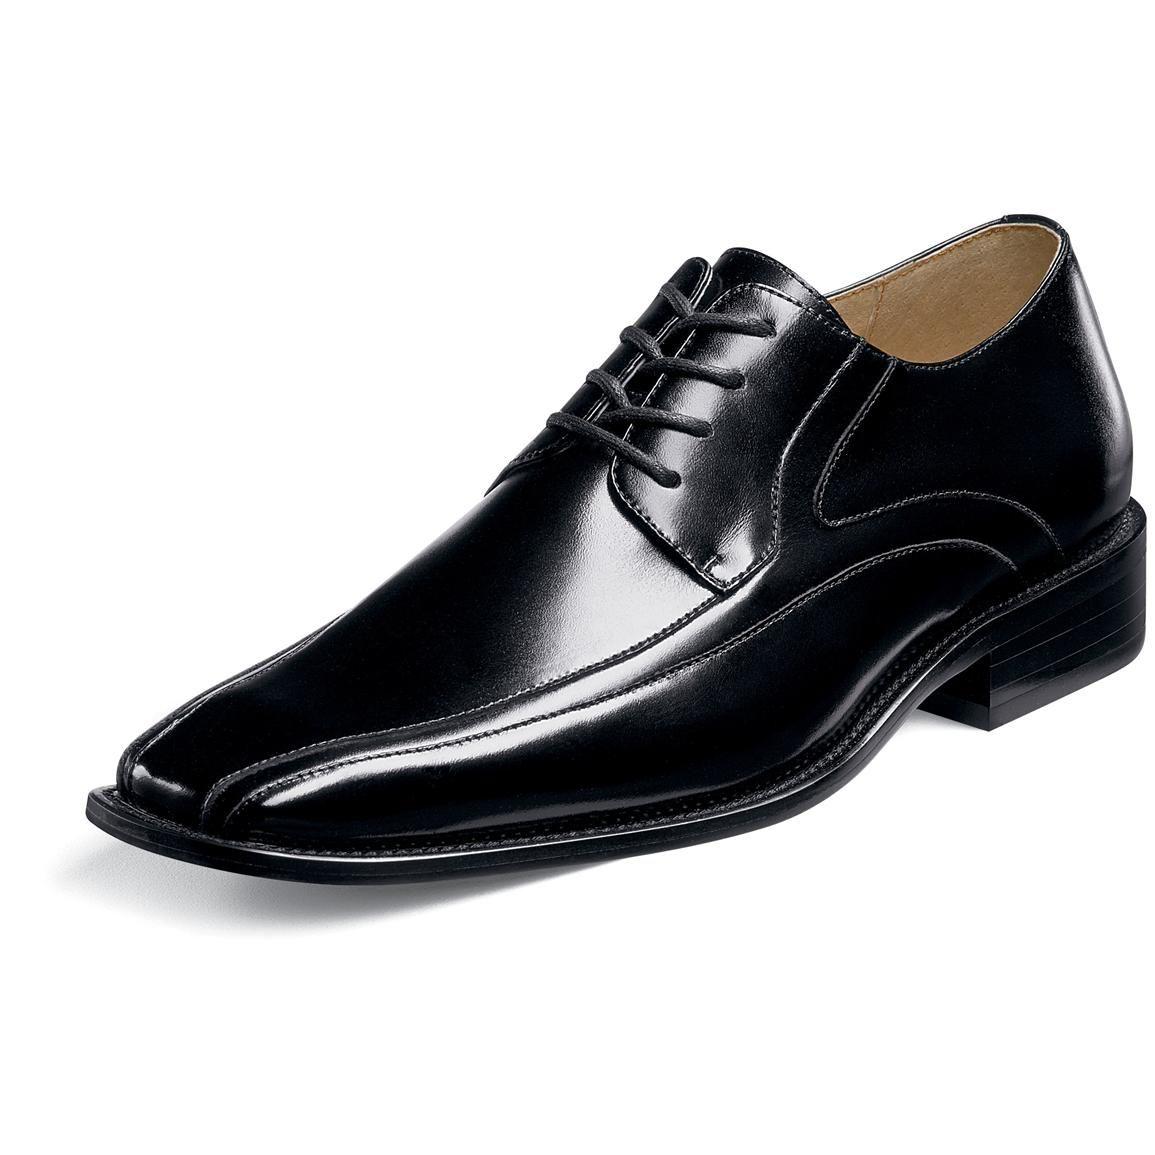 Men's Stacy Adams® Peyton Dress Shoes, Black - 207424, Dress Shoes at  Sportsman's Guide